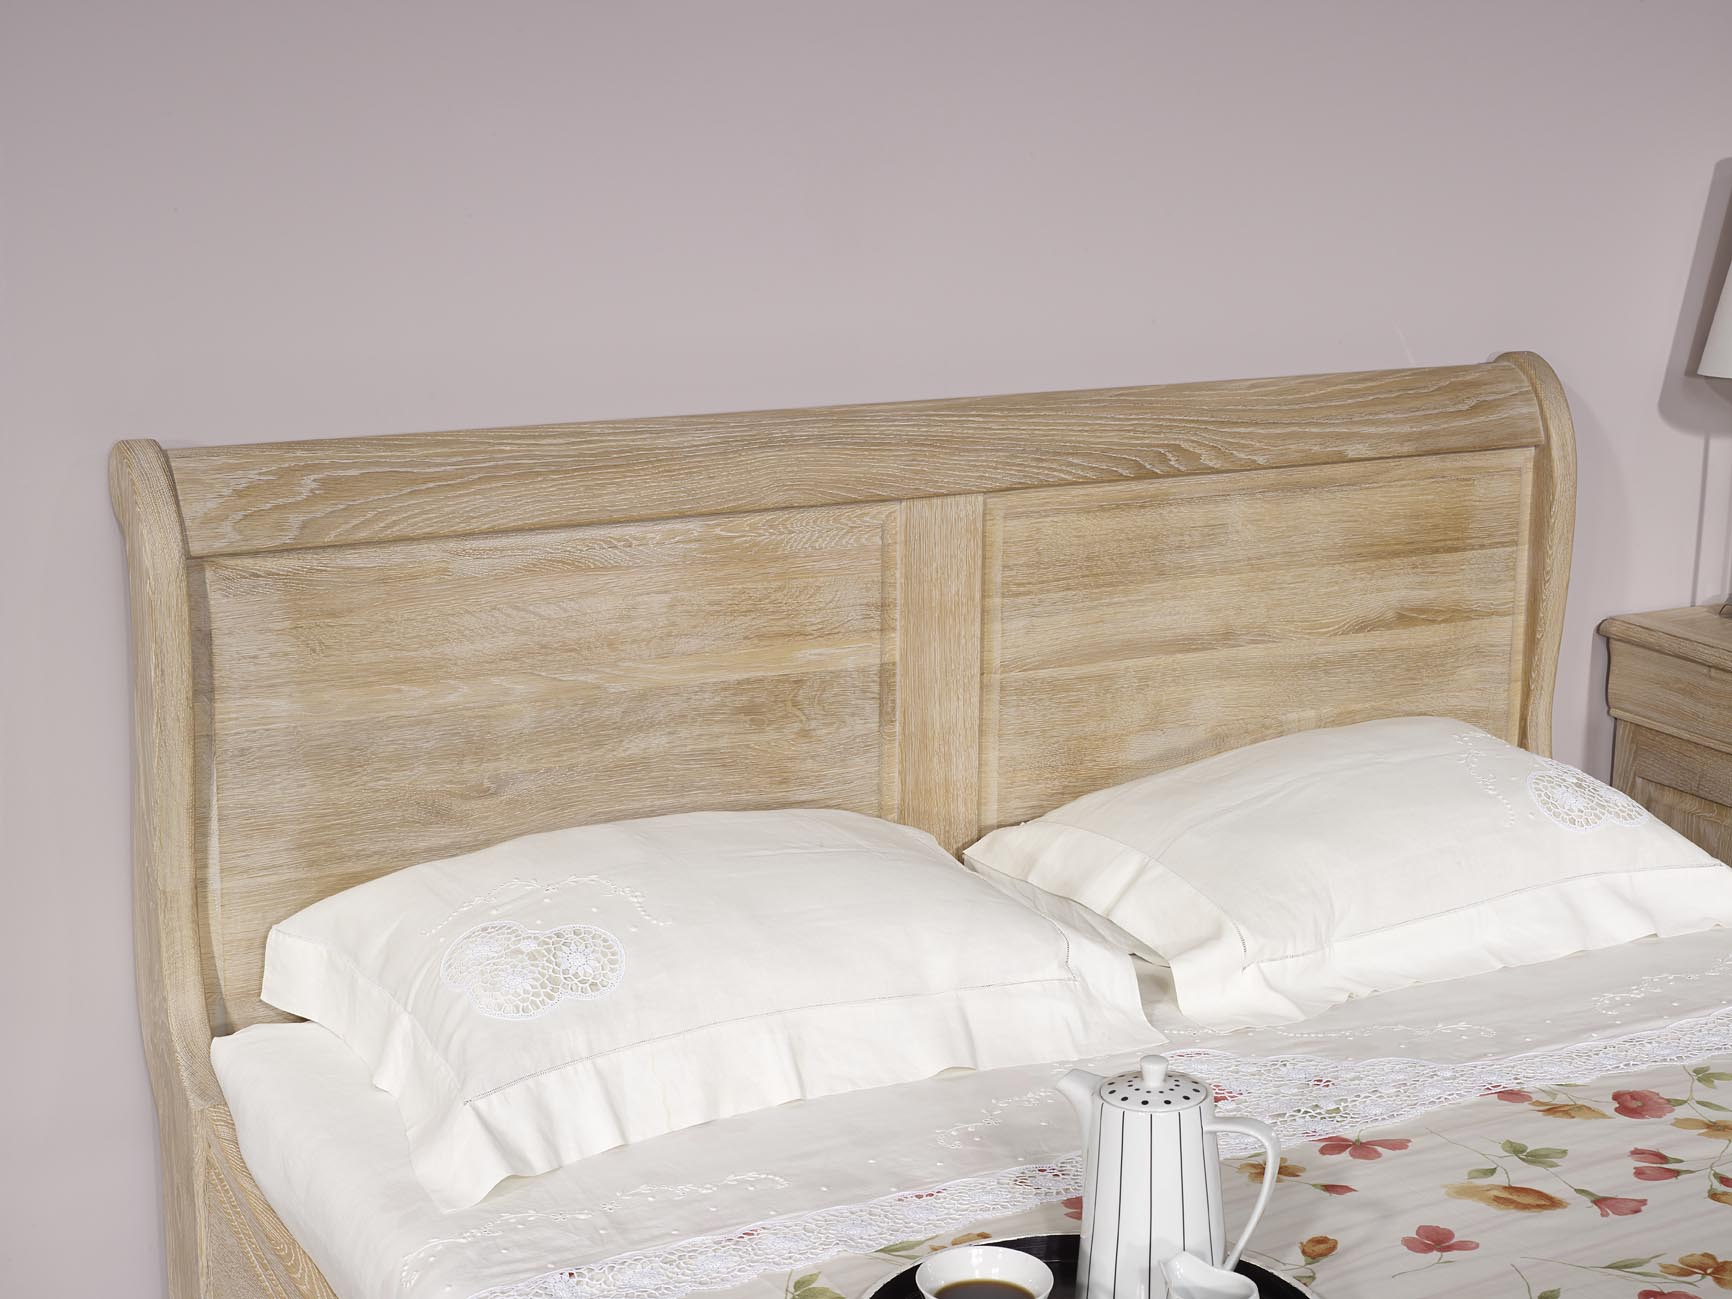 lit bateau en ch ne massif 140 190 de style louis philippe finition ch ne bross blanchi. Black Bedroom Furniture Sets. Home Design Ideas